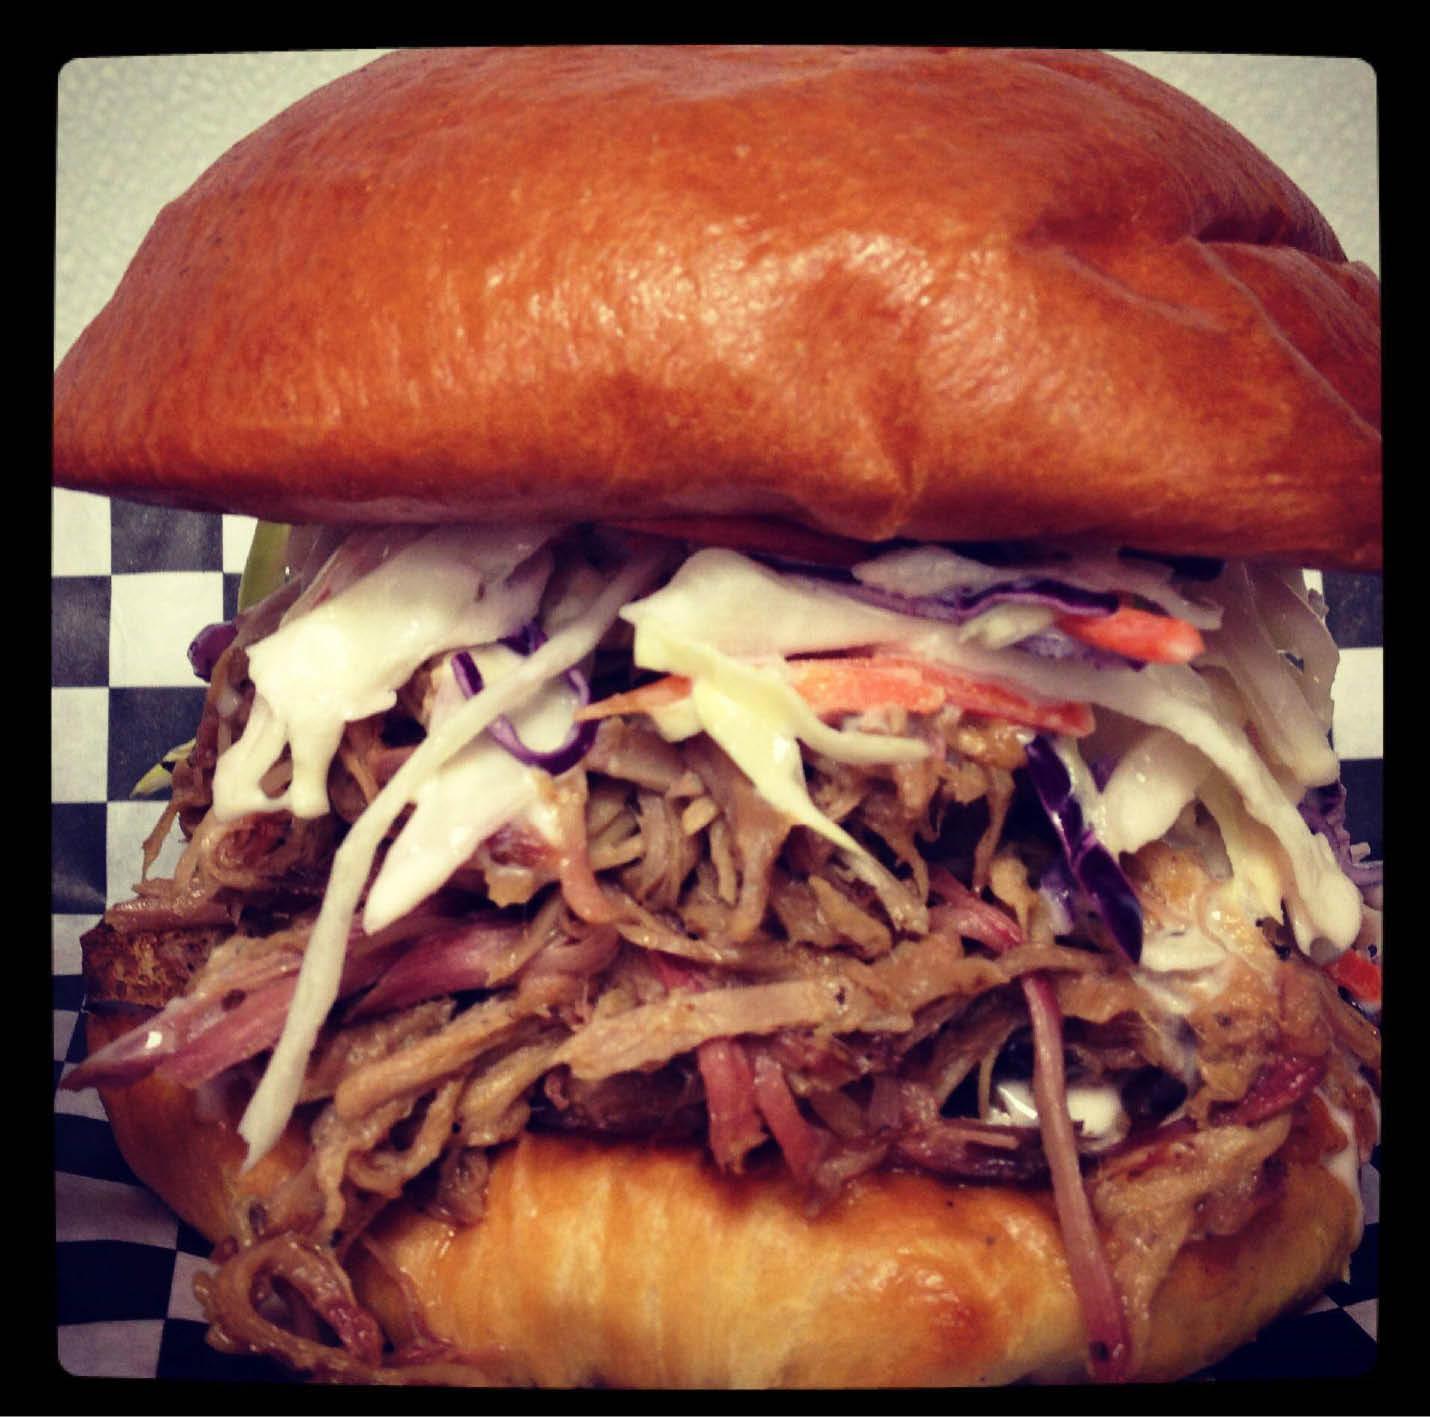 Official overstuffed BBQ pork sandwich in Harrisburg